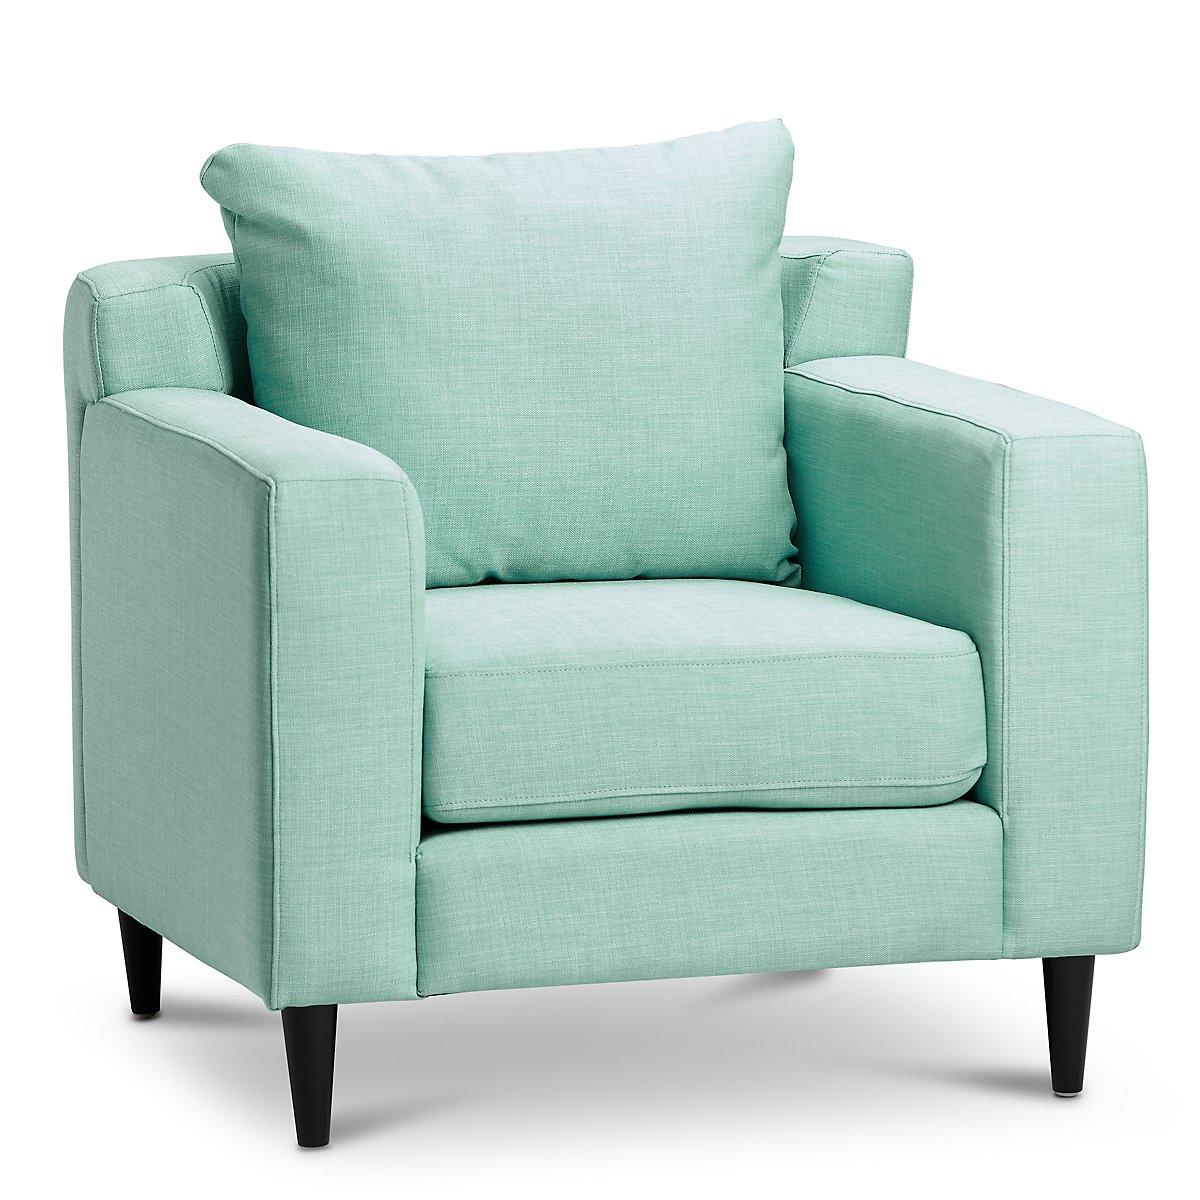 Novara Light Blue Fabric Accent Chair | Living Room ...